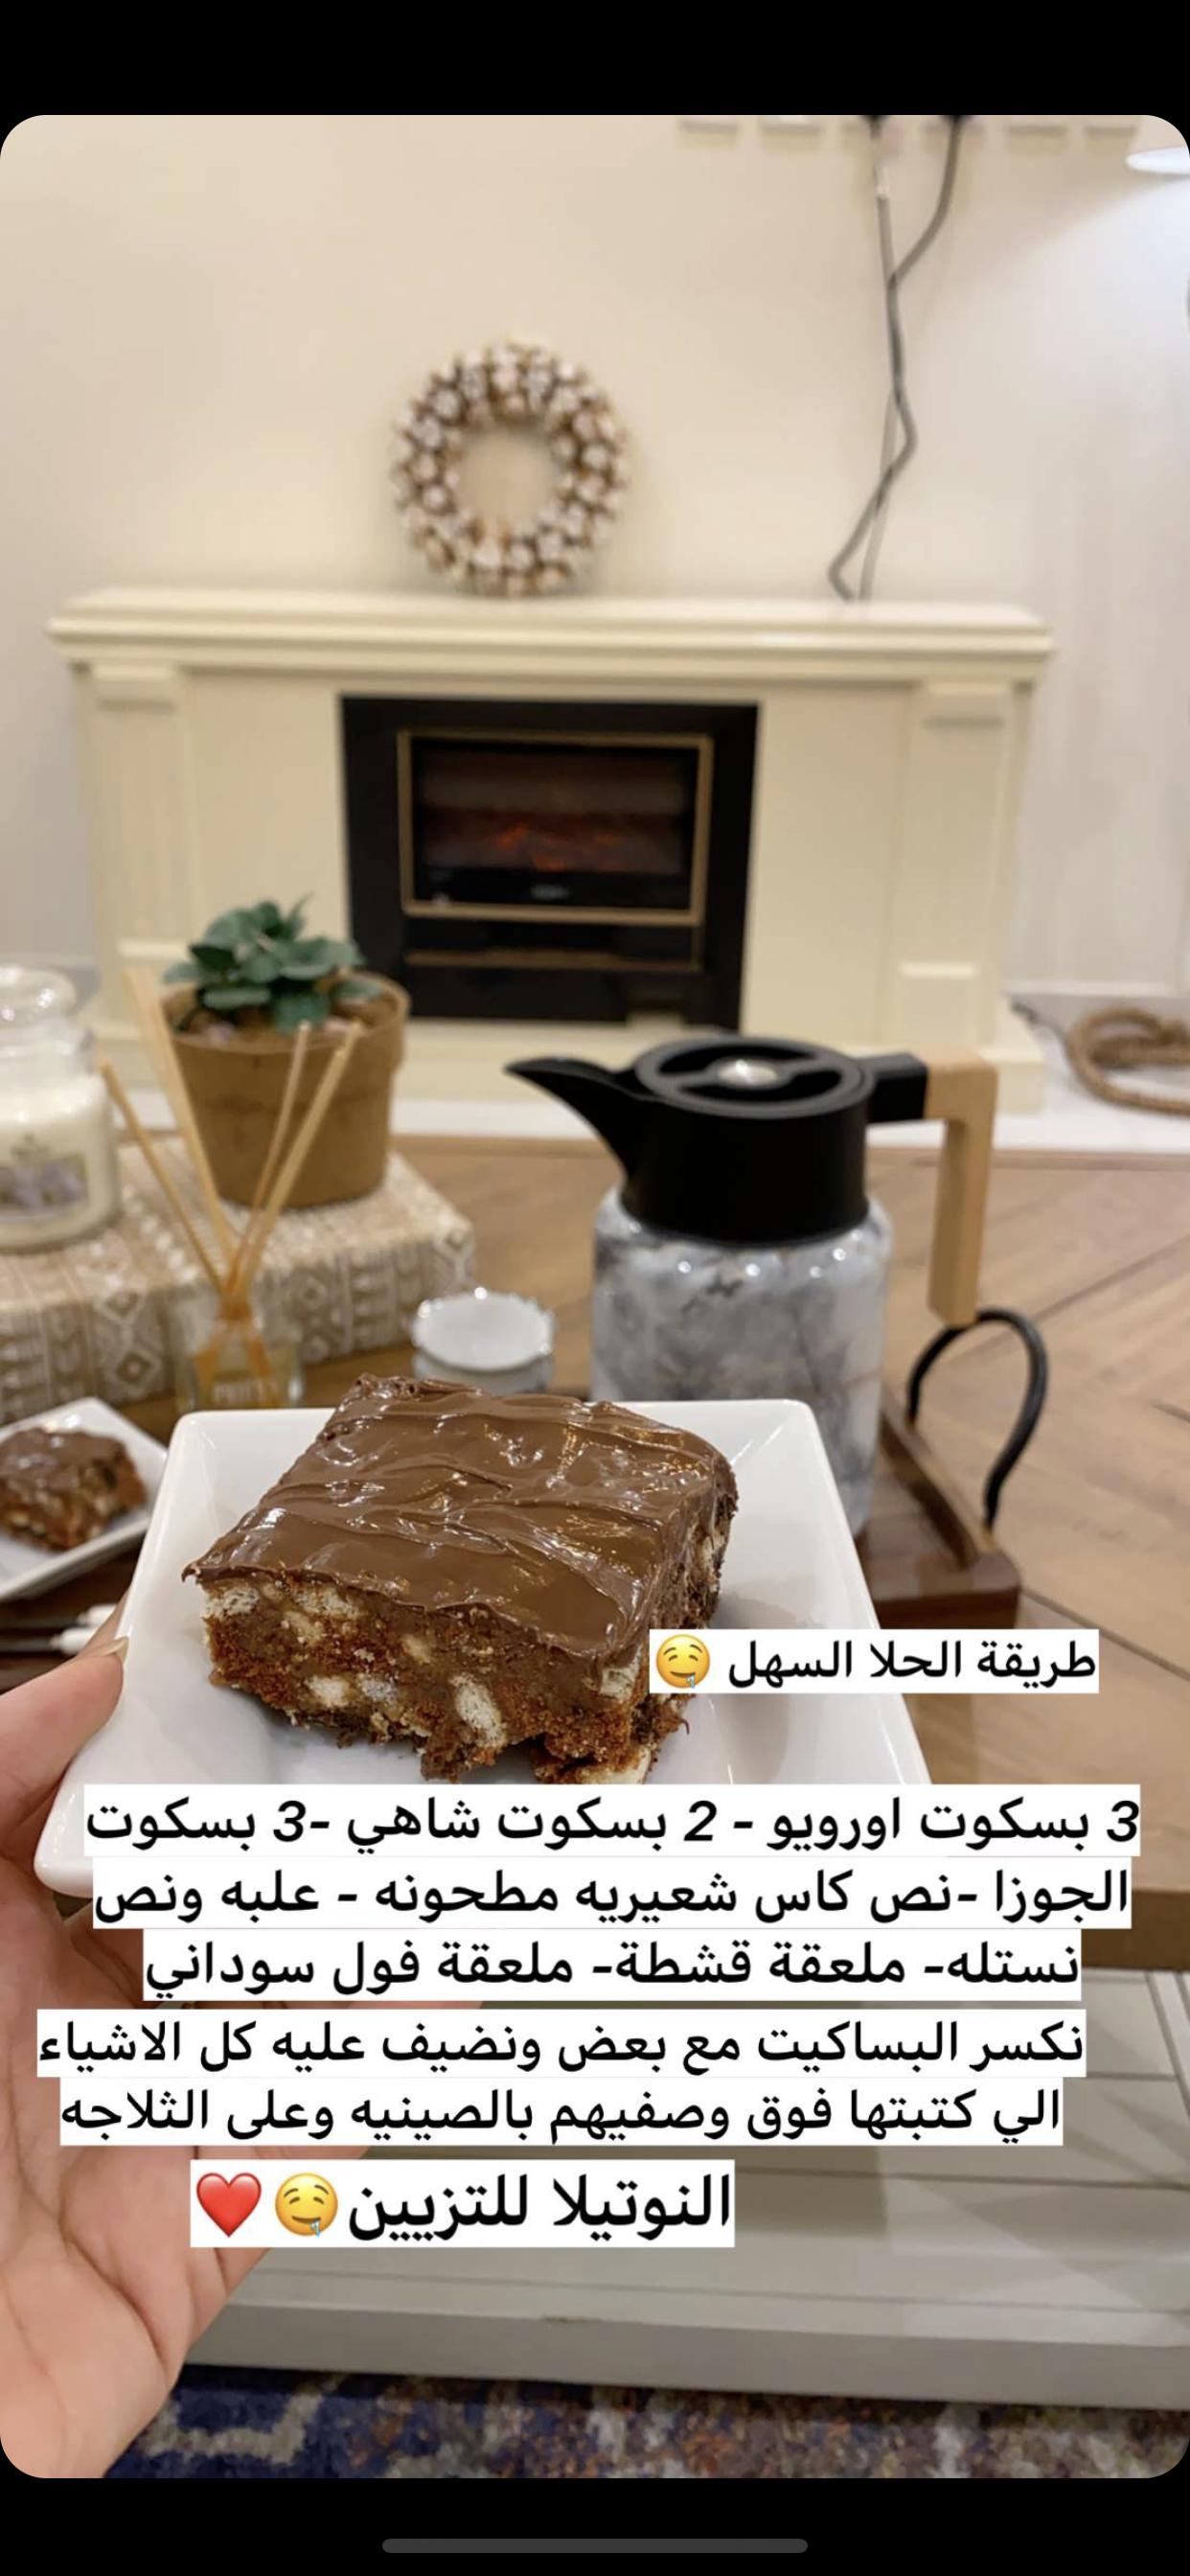 حلا سهل ولذيذ Sweets Recipes Yummy Food Dessert Recipes